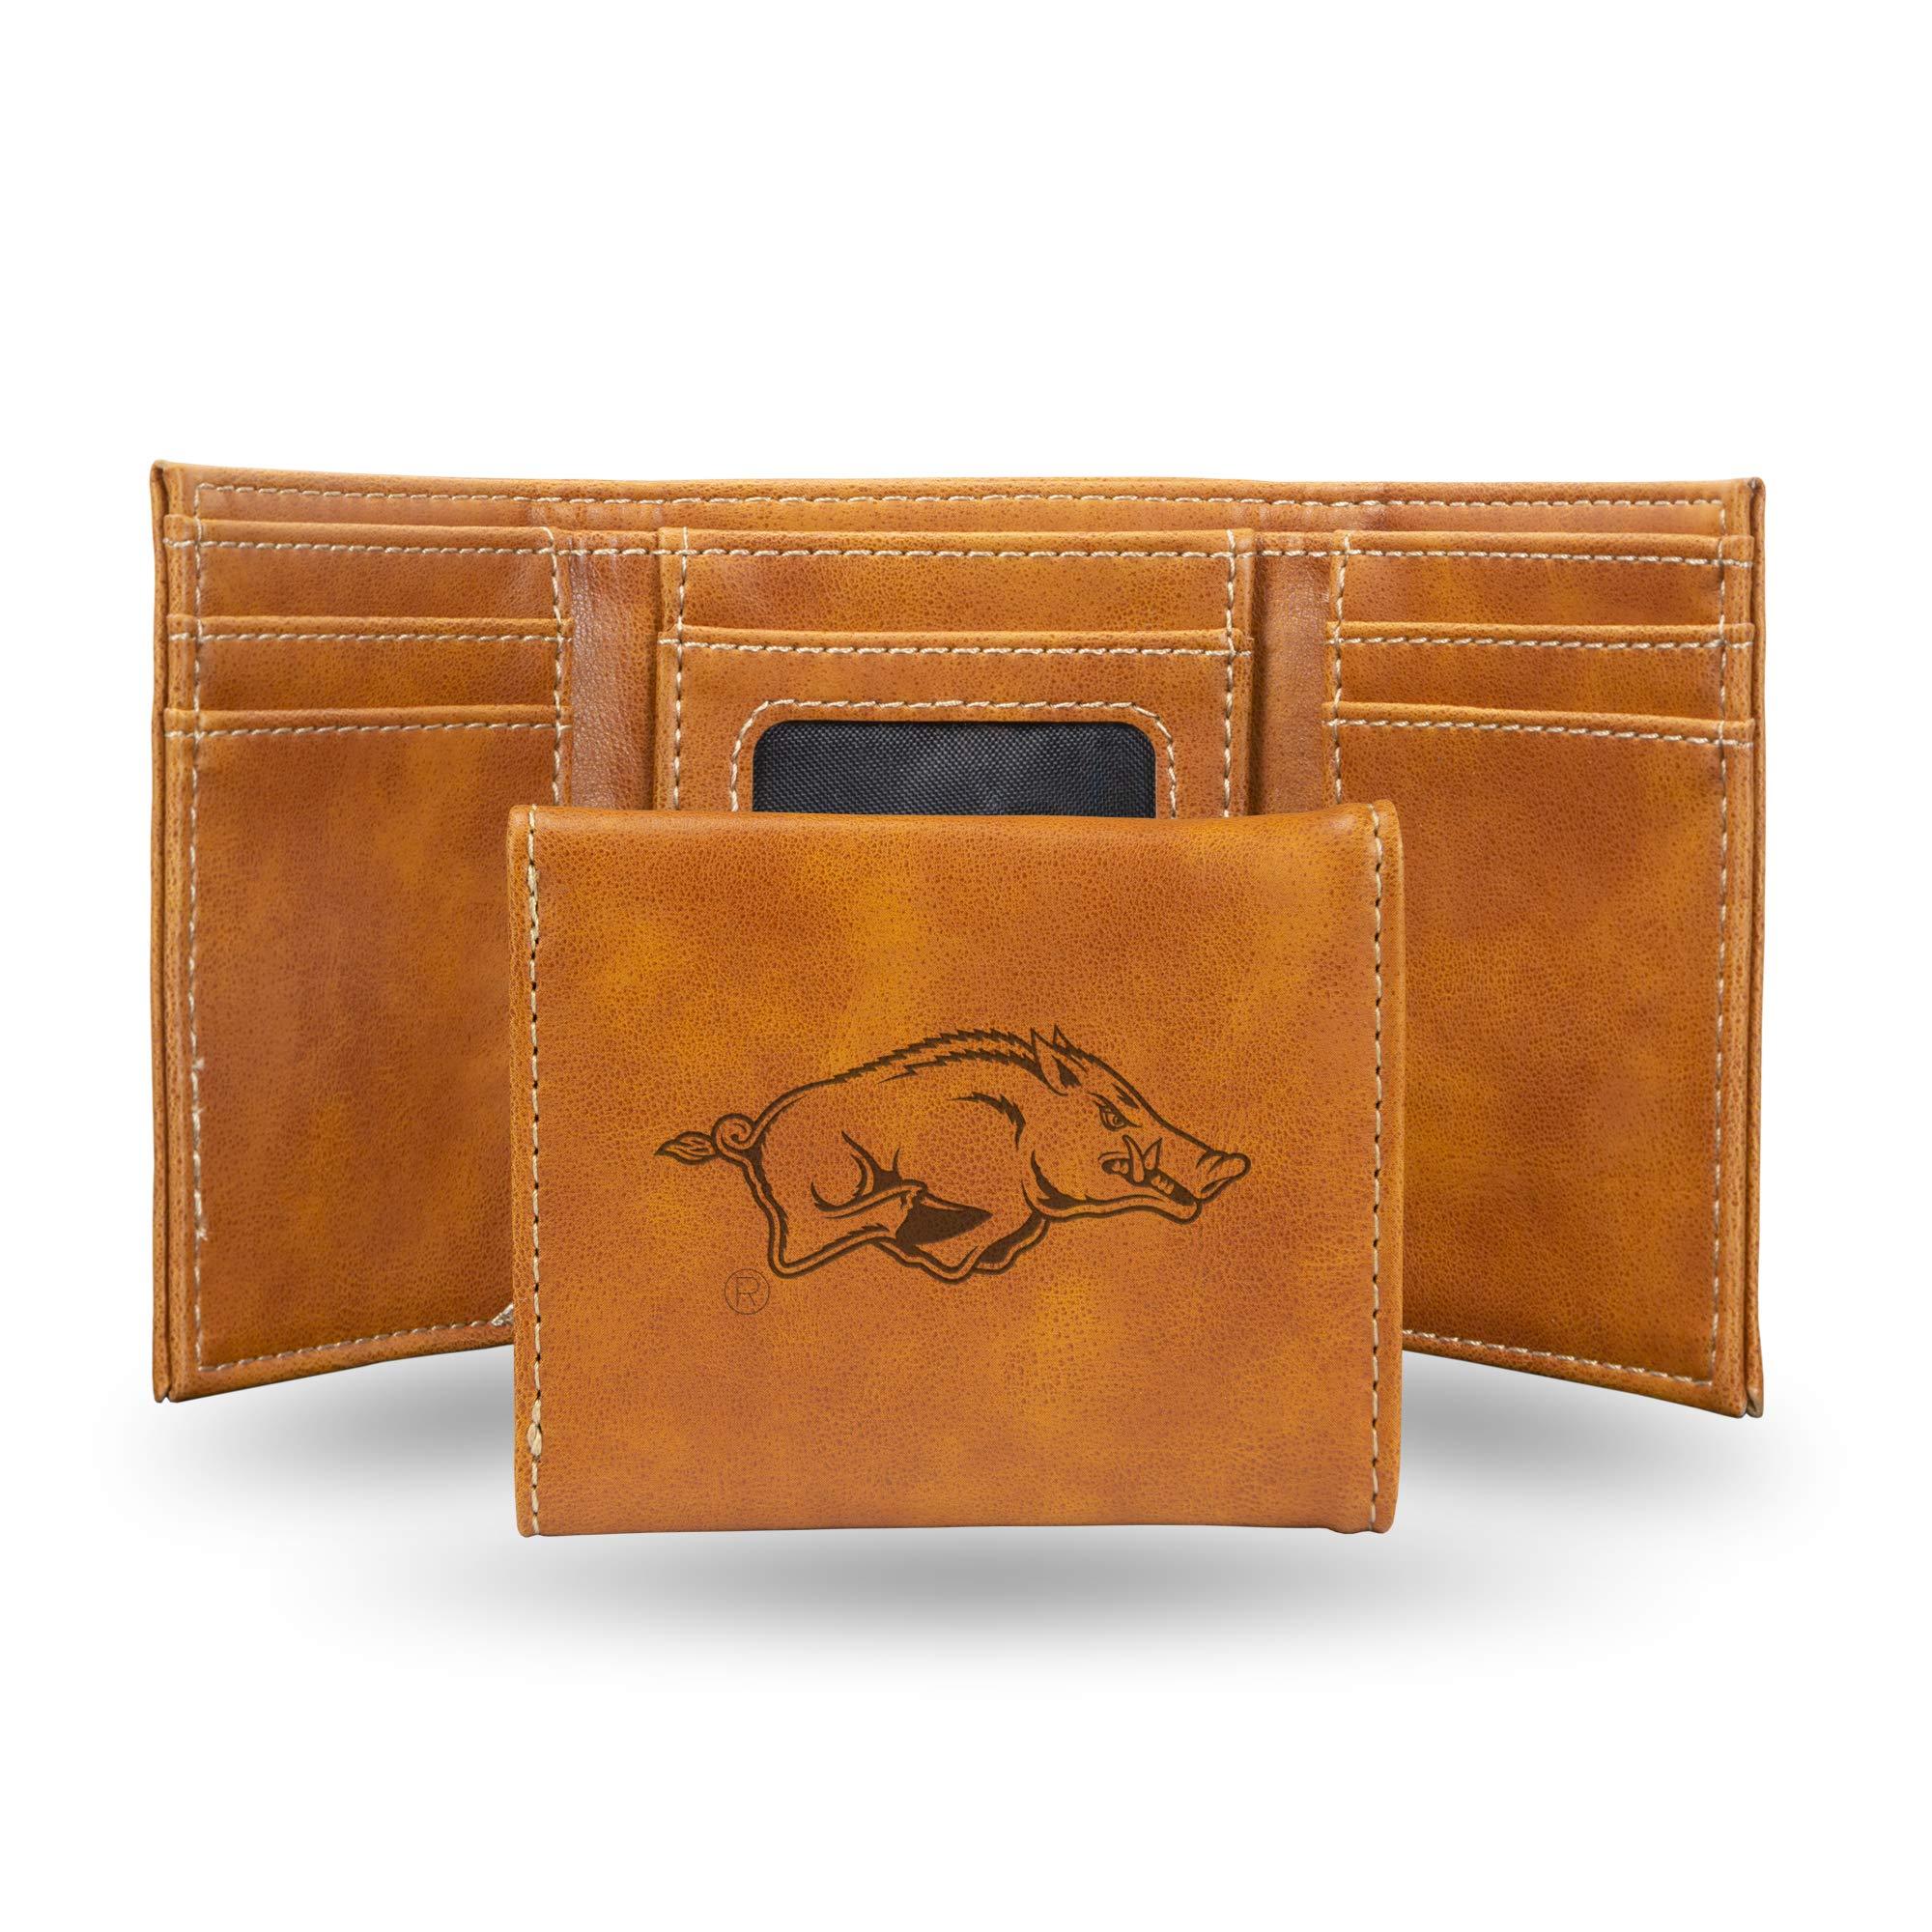 NCAA Rico Industries Laser Engraved Billfold Wallet Iowa Hawkeyes